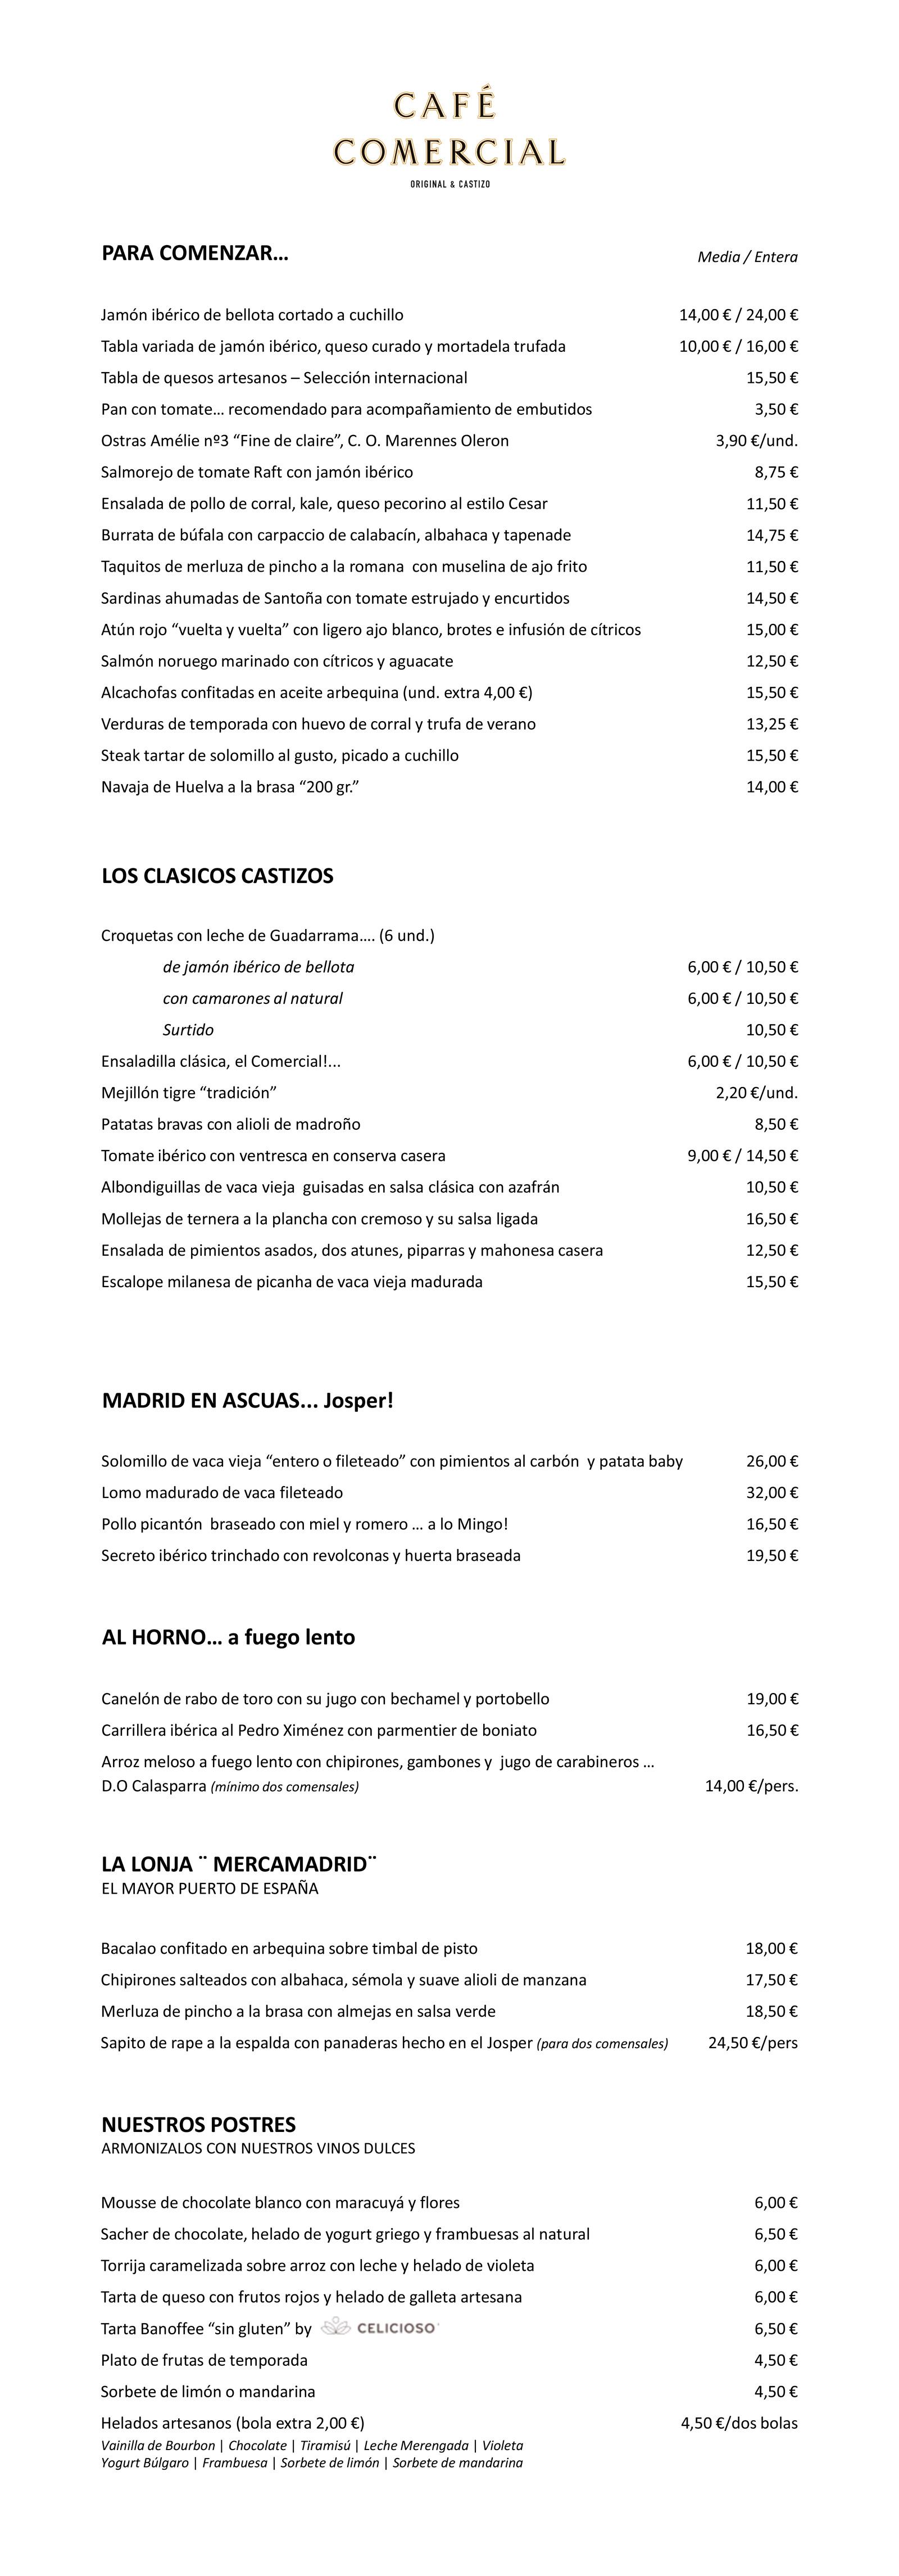 Café Comercial-Carta del restaurante | Café Comercial